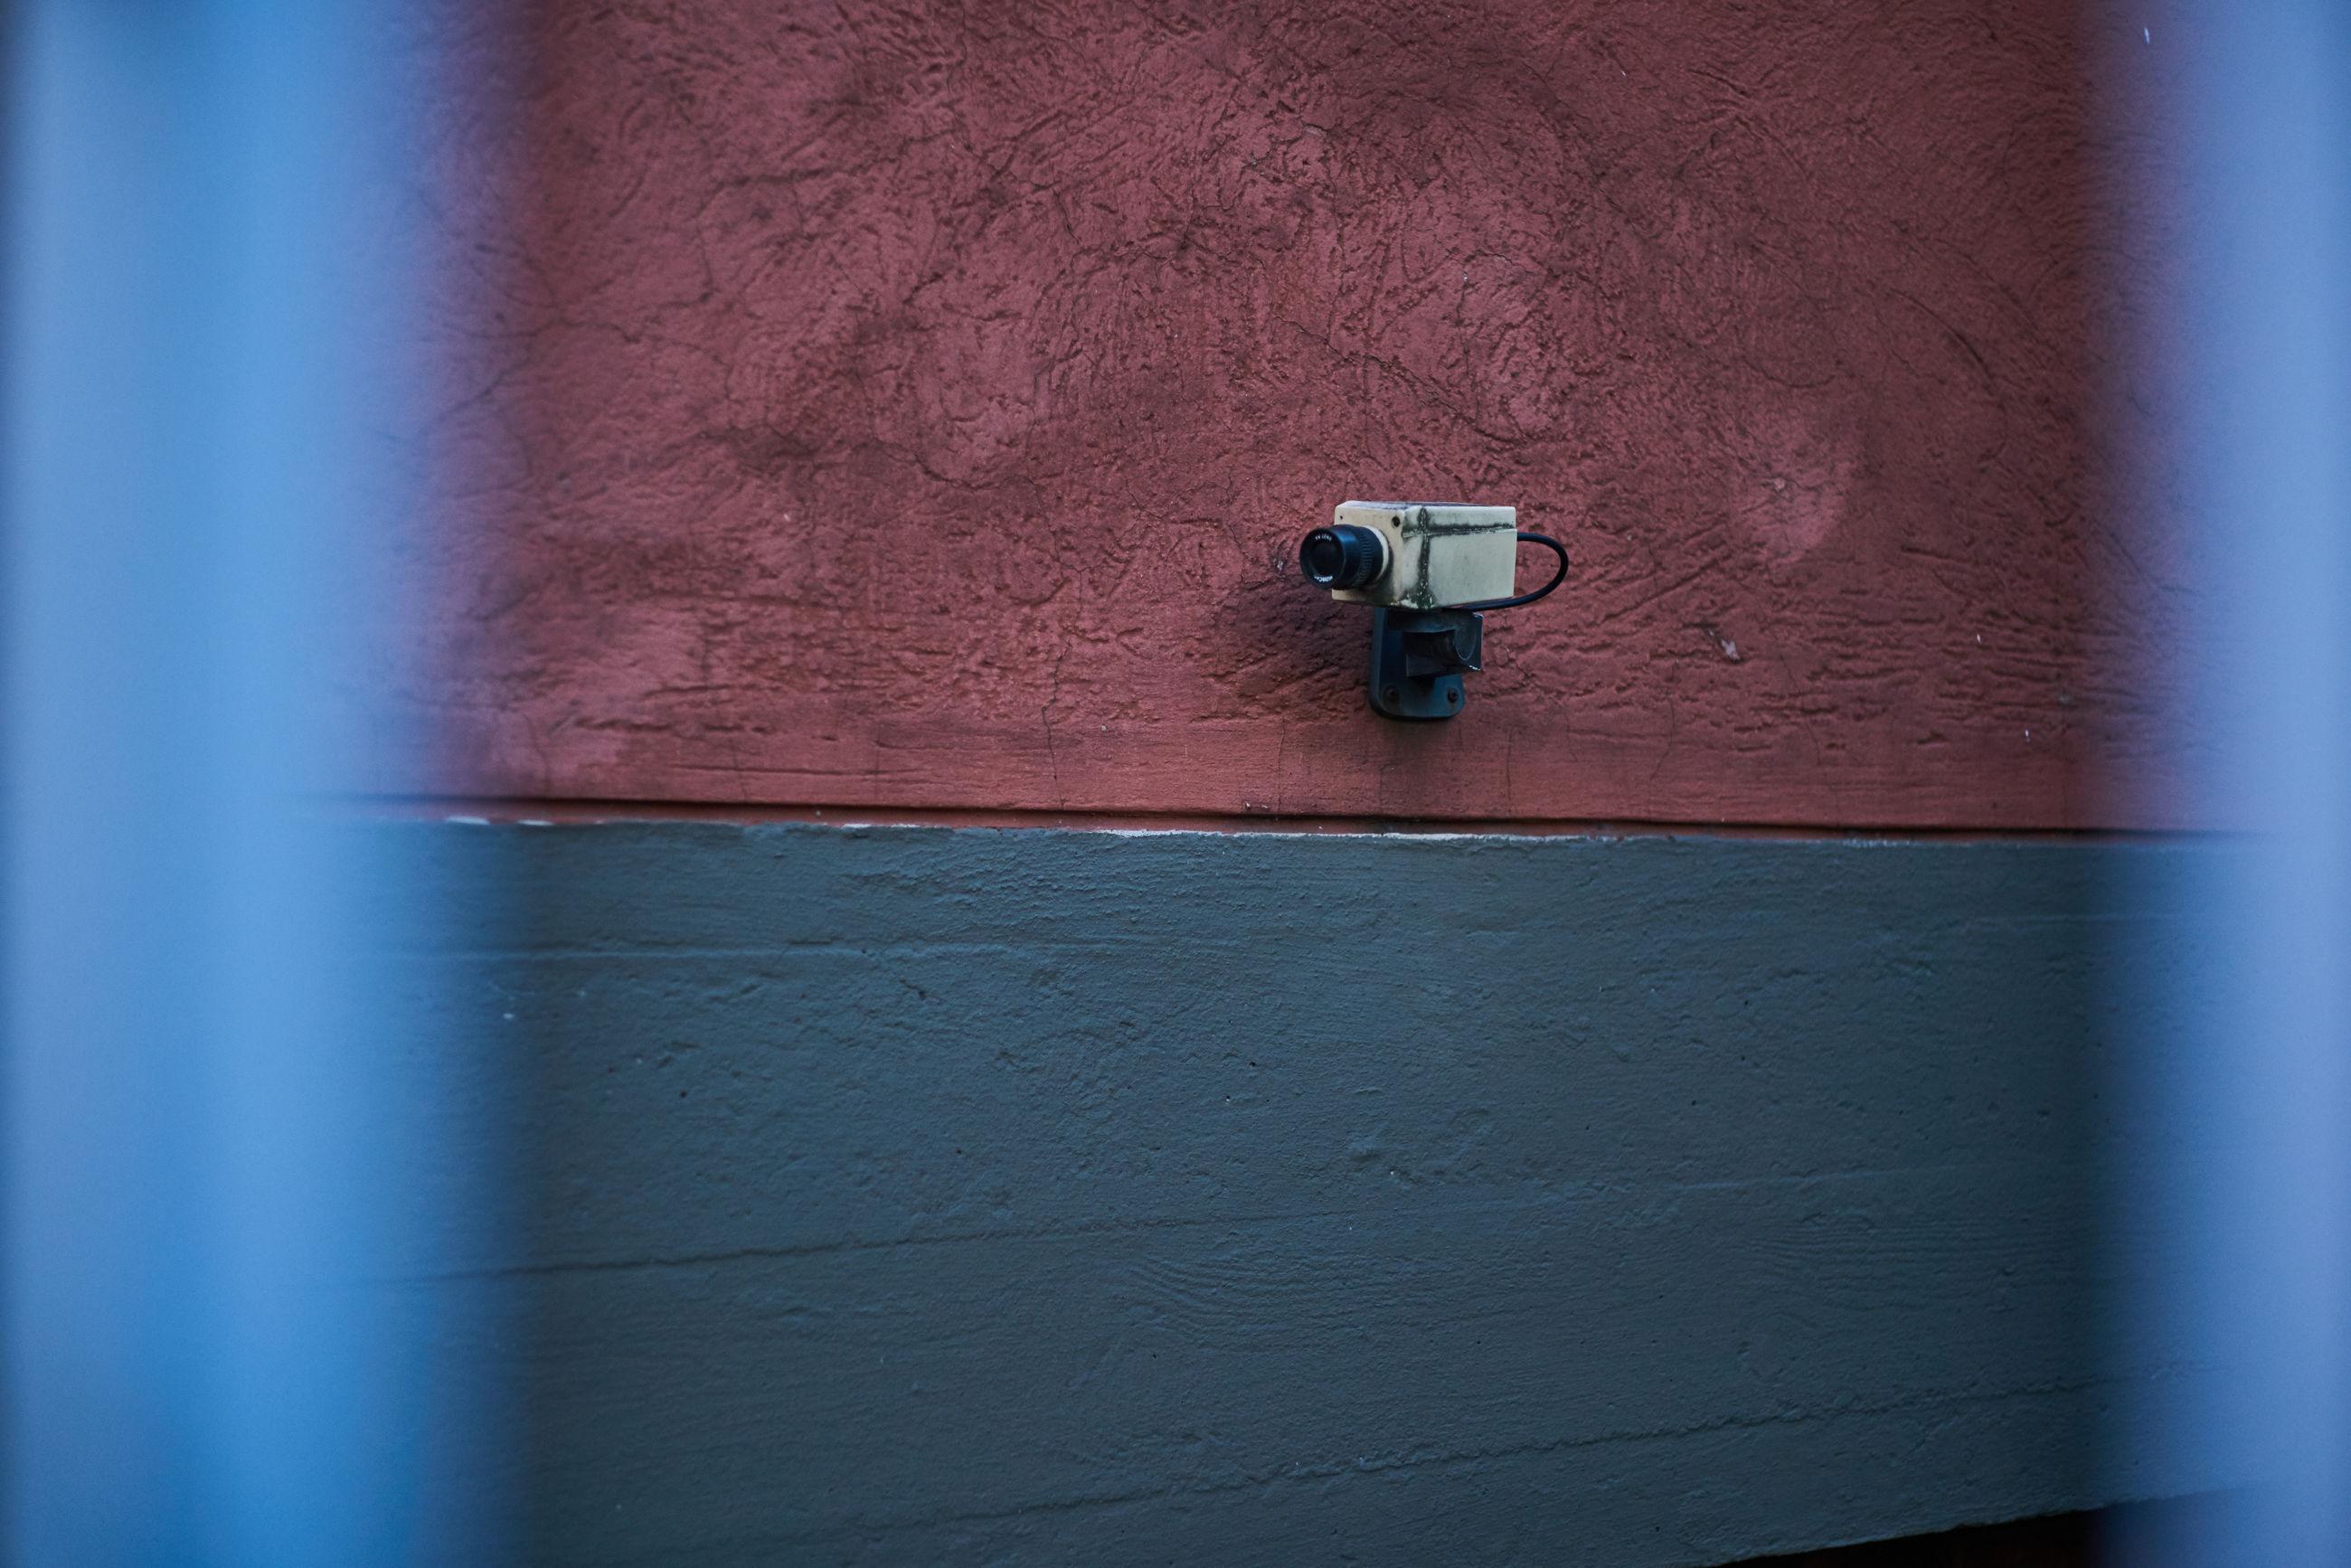 Close-up of camera on wall